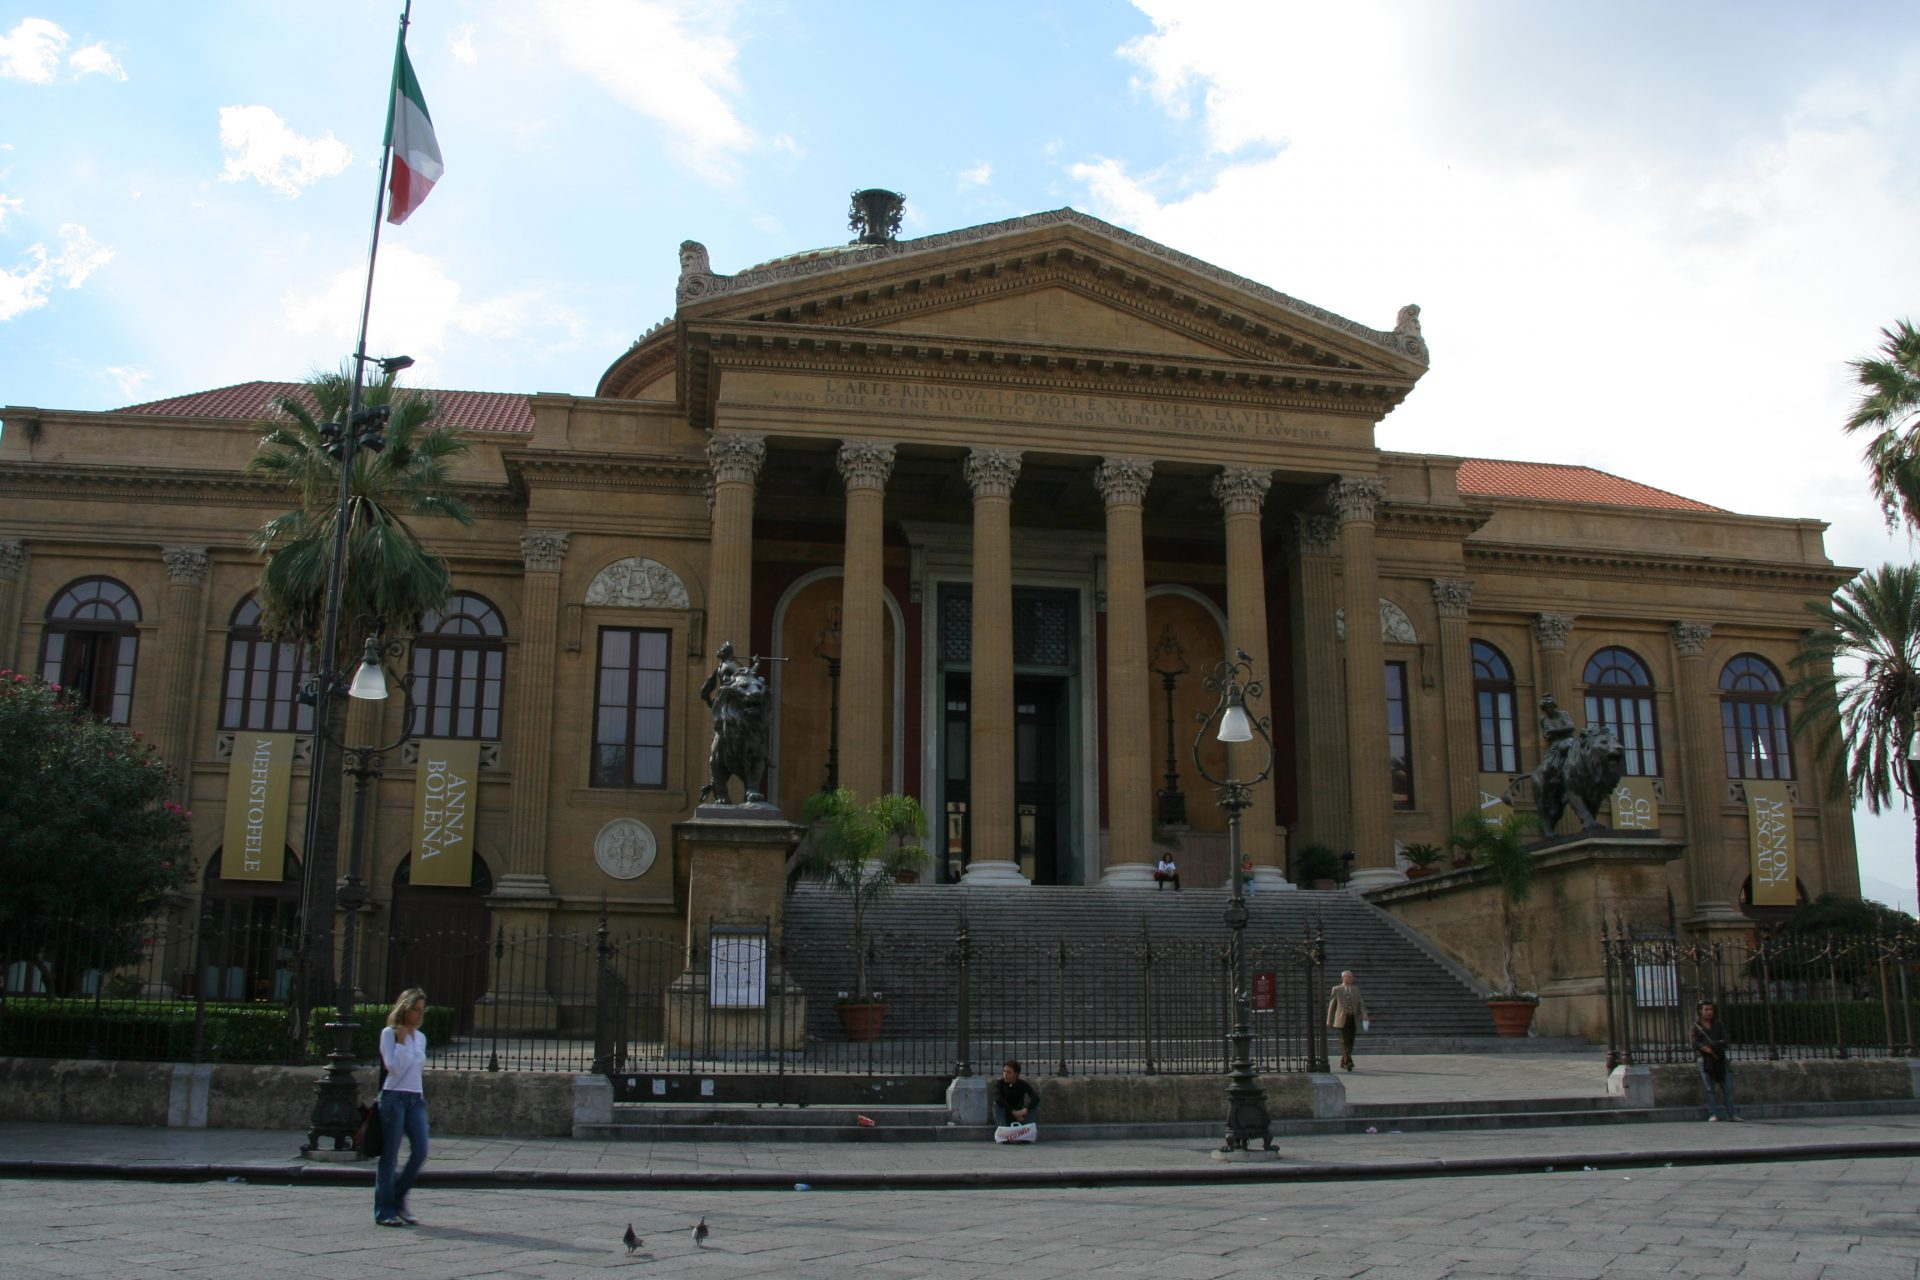 Teatro Massimo w Palermo